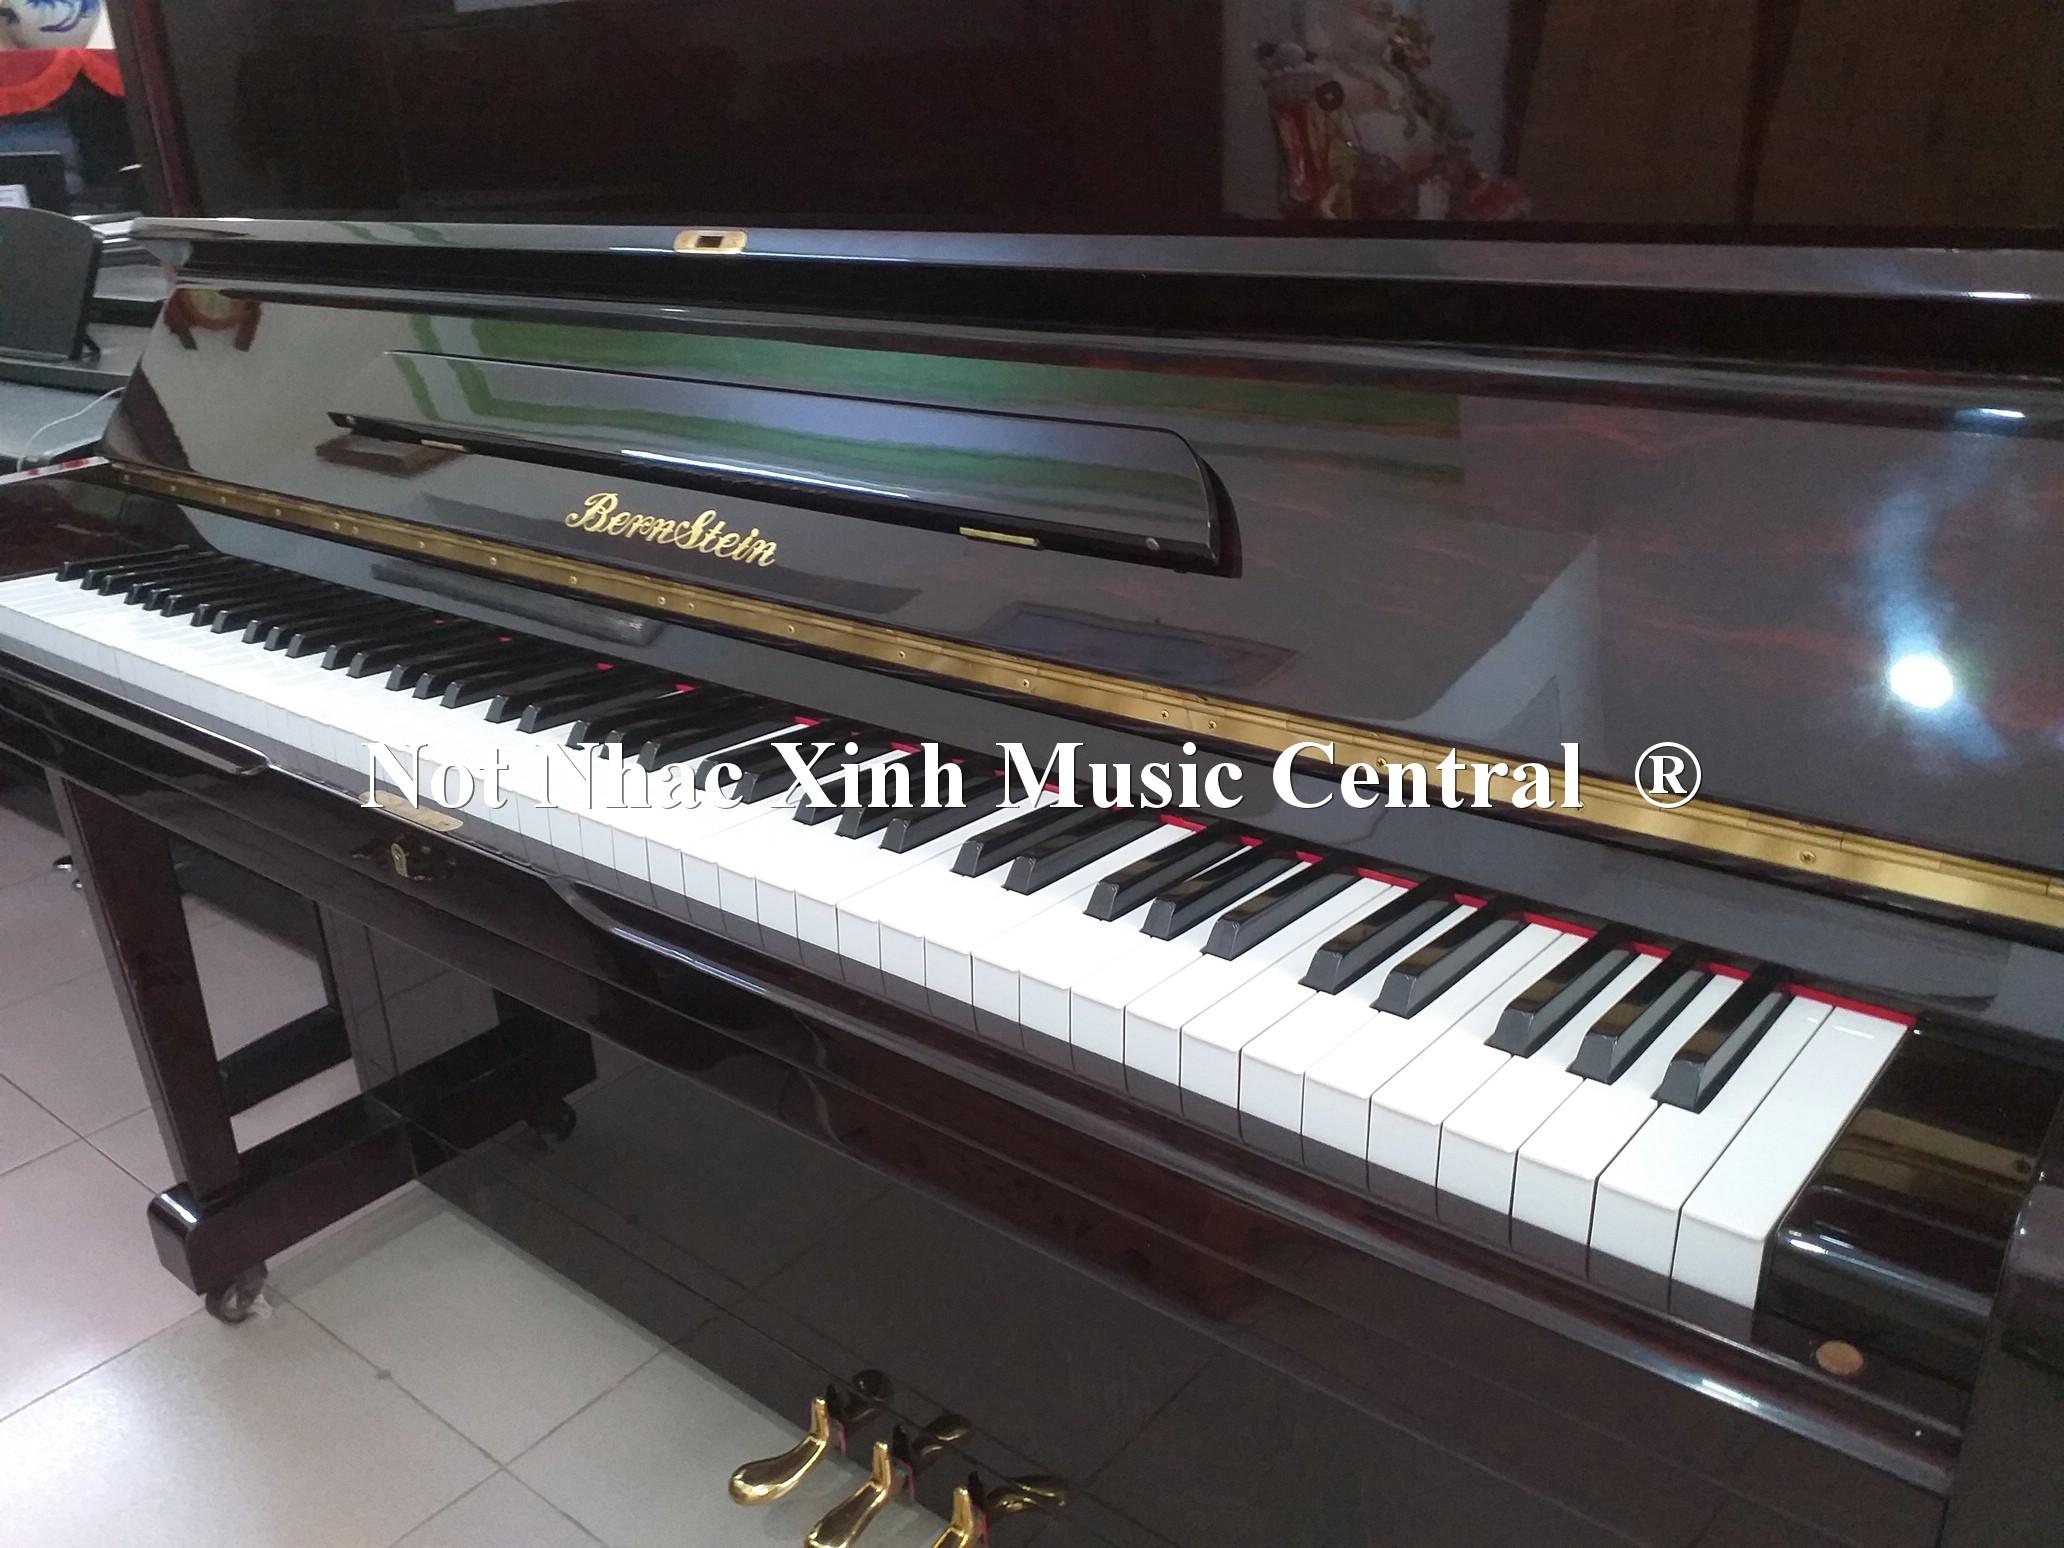 Đàn piano cơ Bern Stein 122B